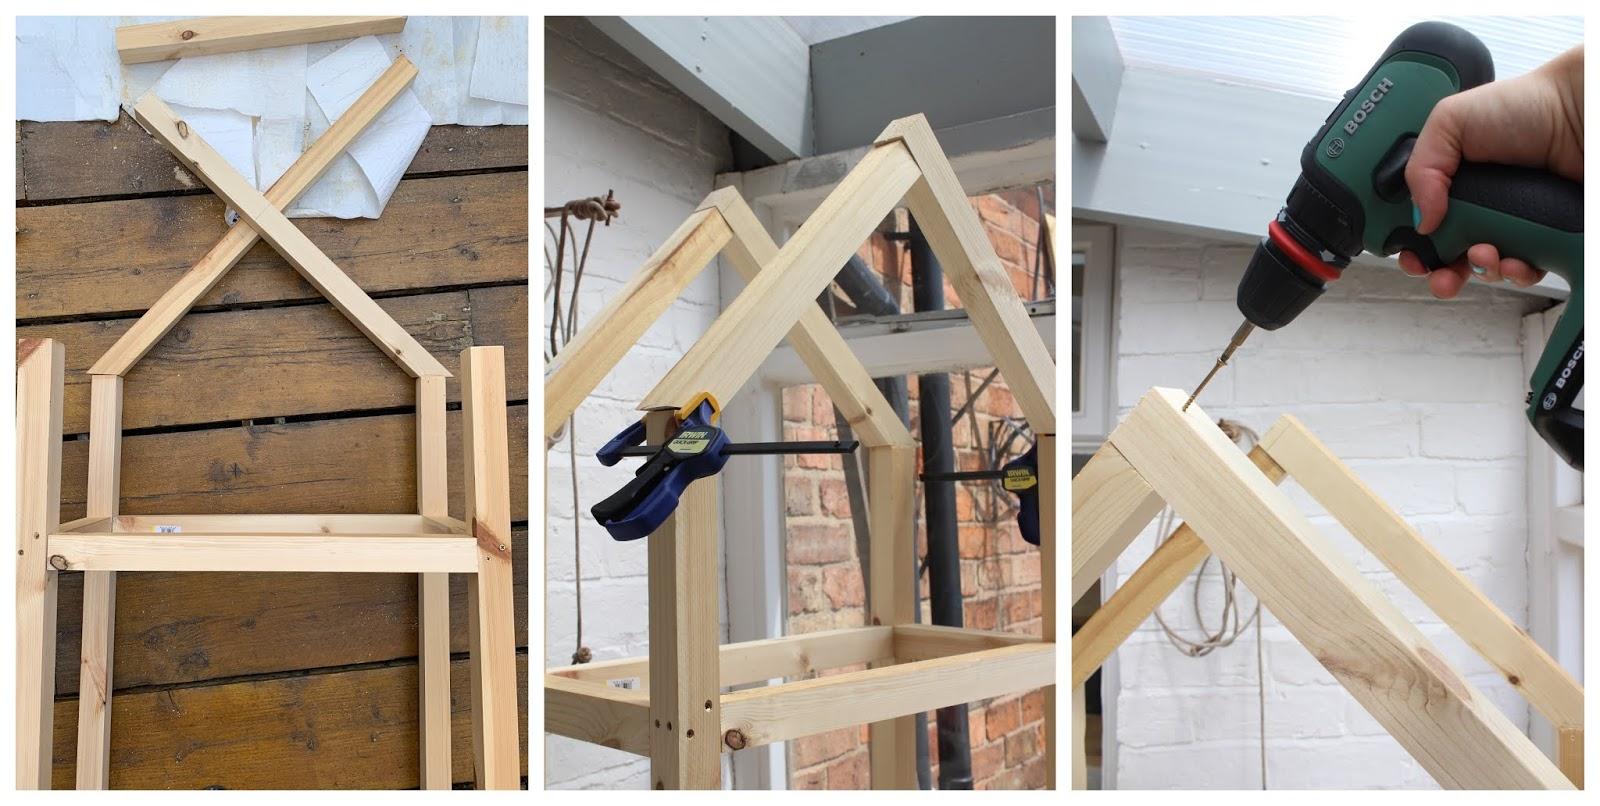 How to create a house shape with wood